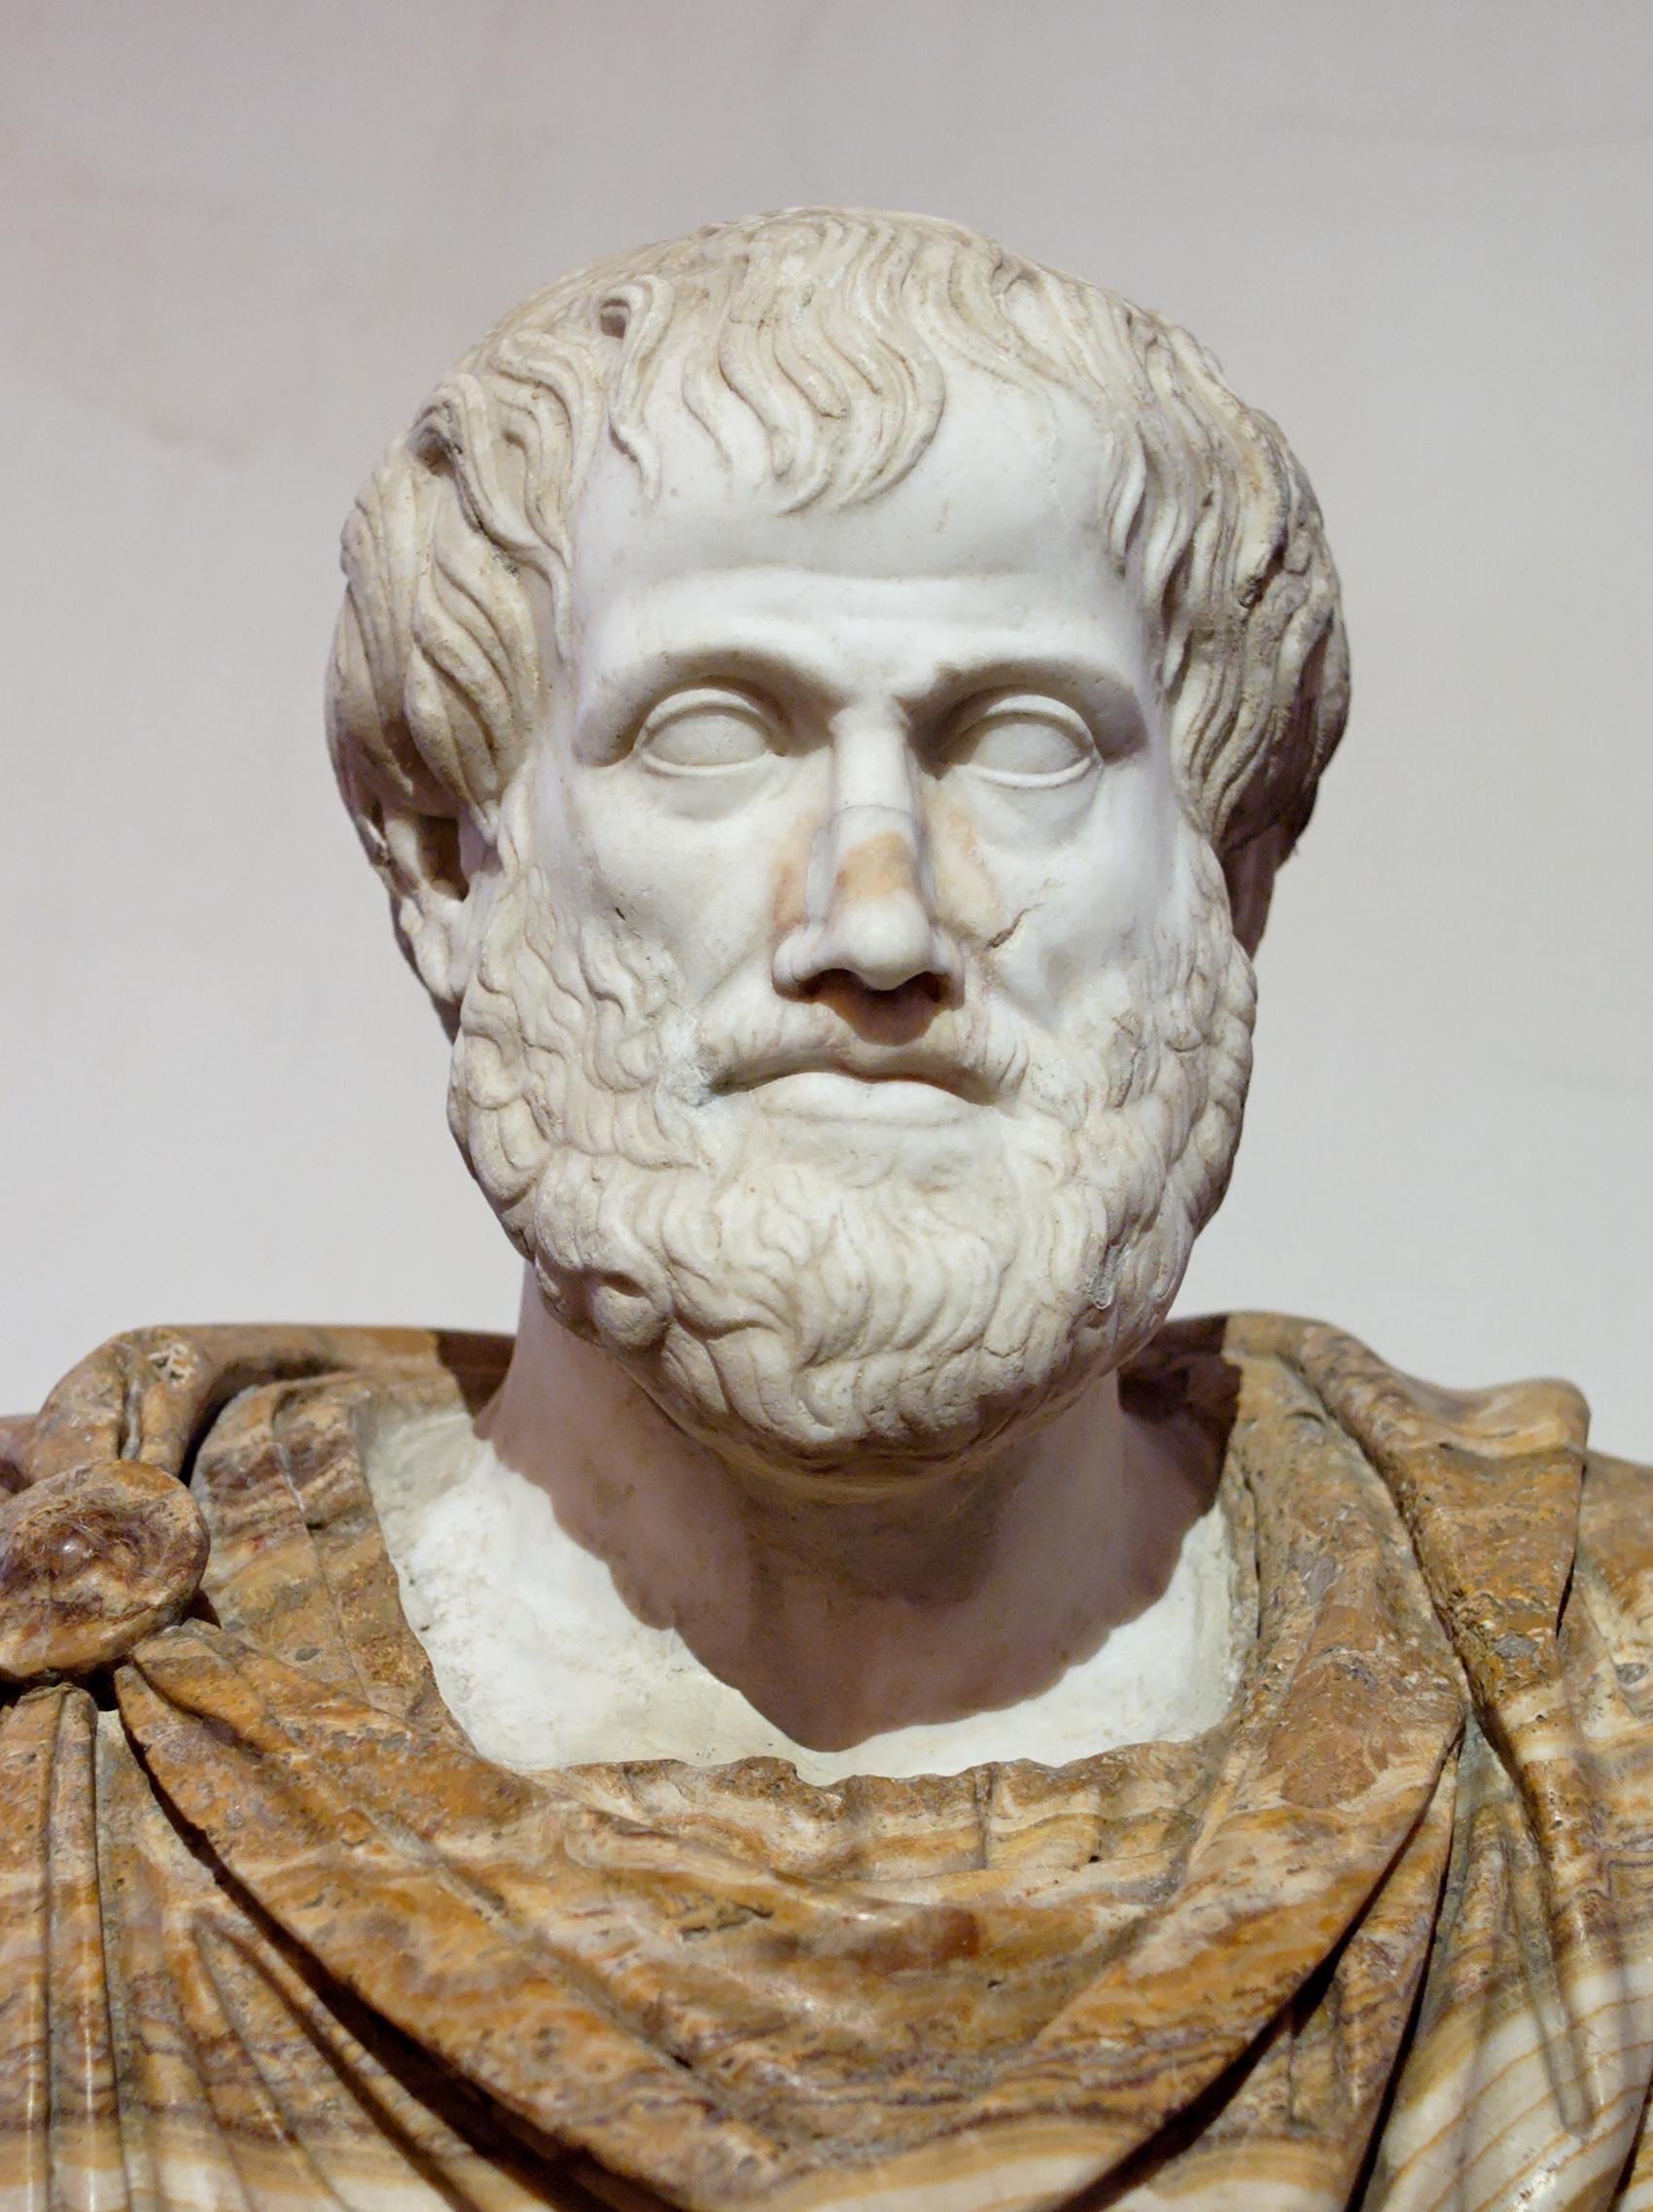 https://i0.wp.com/upload.wikimedia.org/wikipedia/commons/a/ae/Aristotle_Altemps_Inv8575.jpg